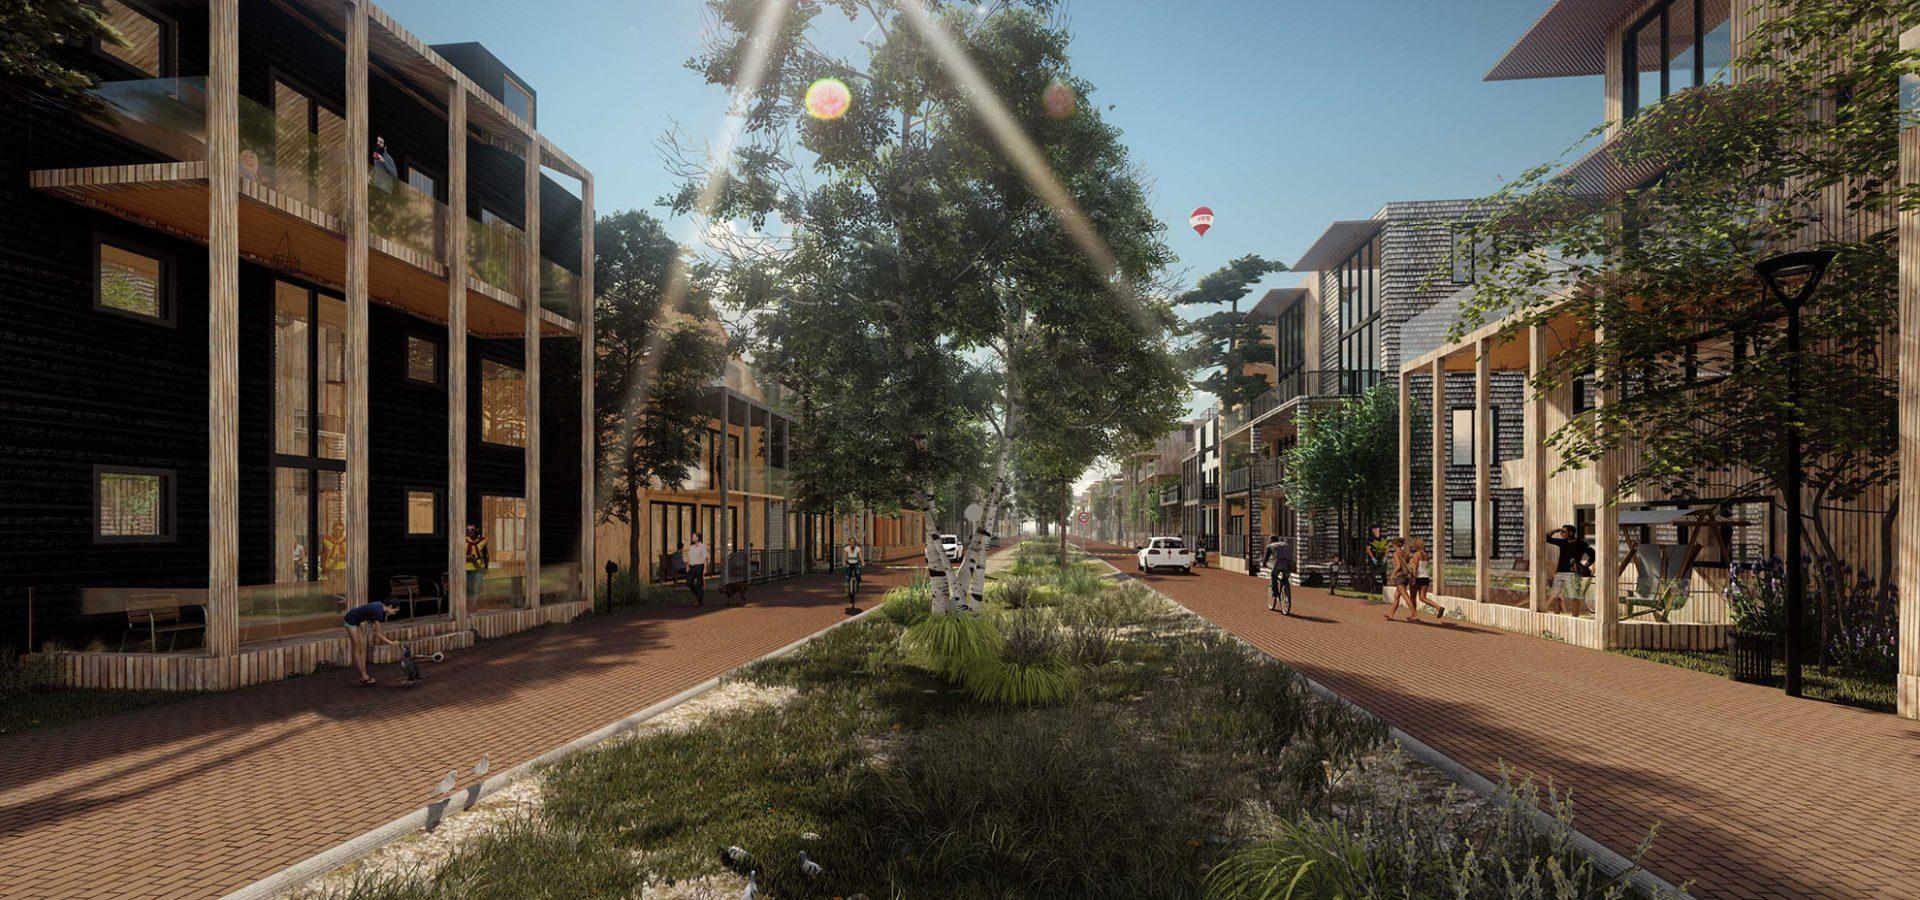 FARO architecten IJburg fase 2 Amsterdam 04